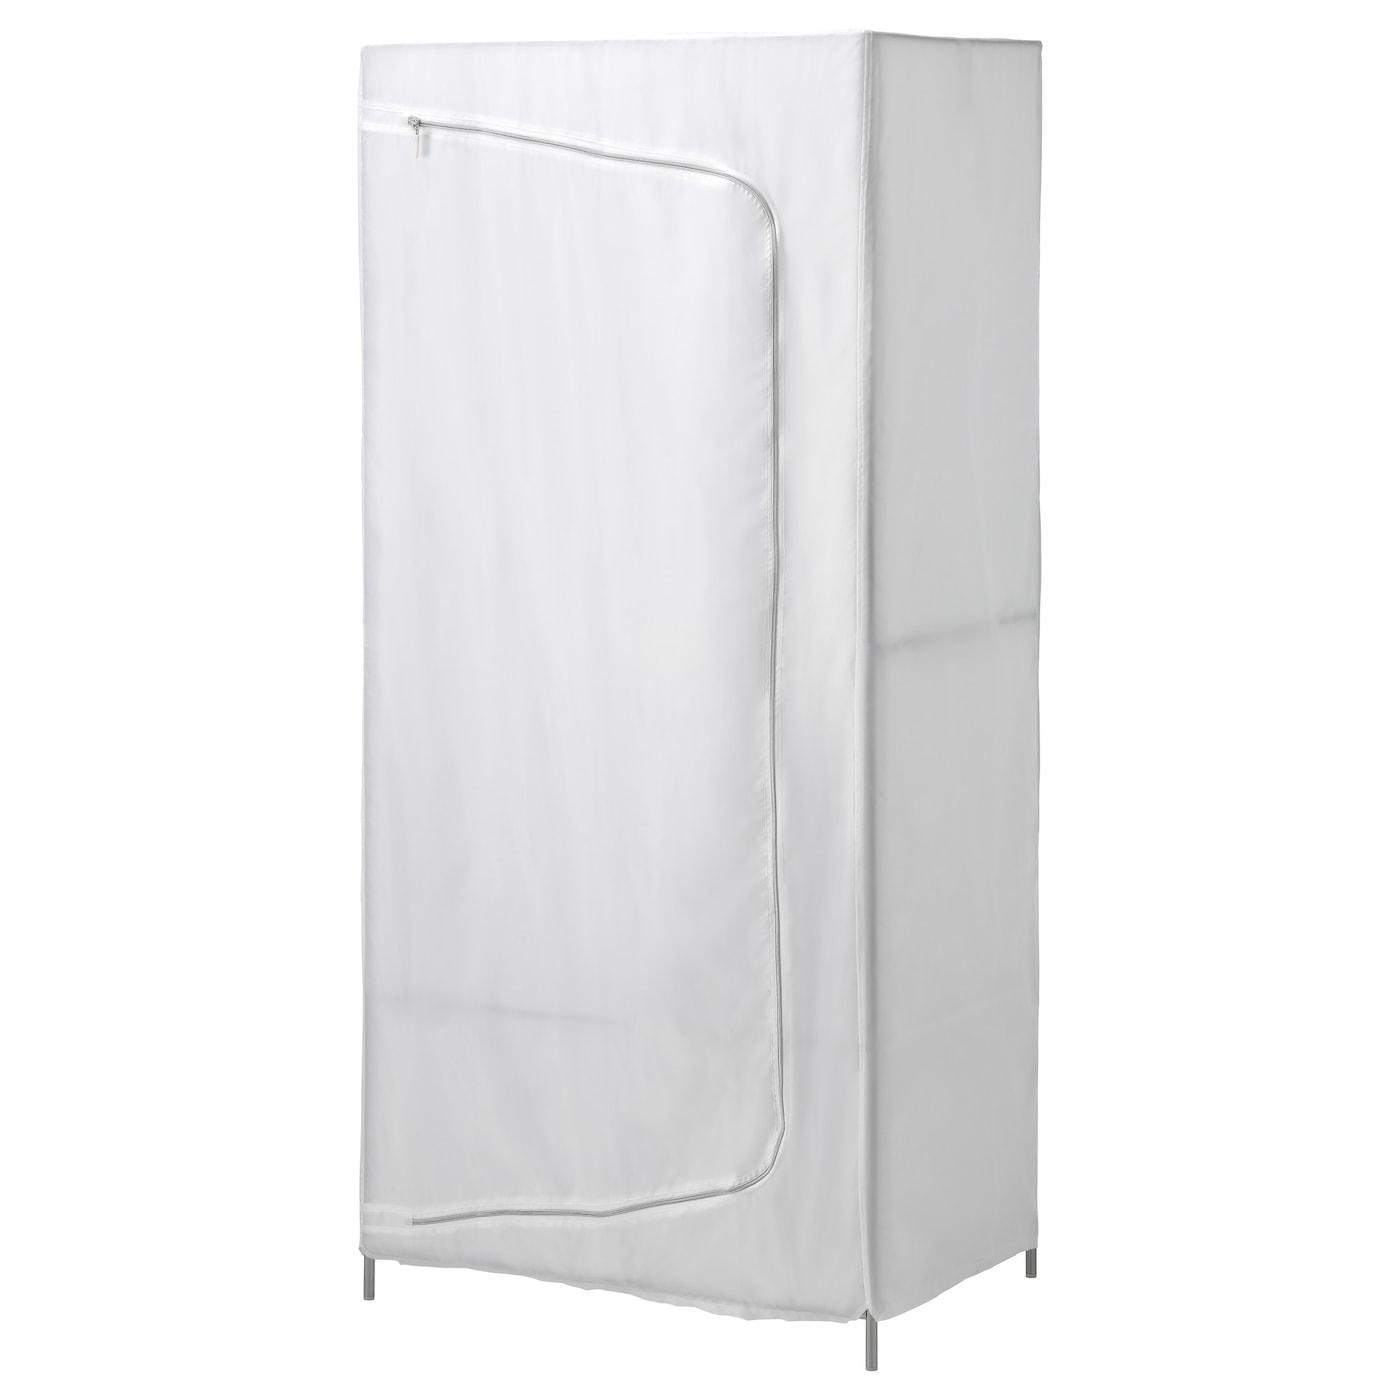 Breim Wardrobe White 80x55x180 Cm Ikea